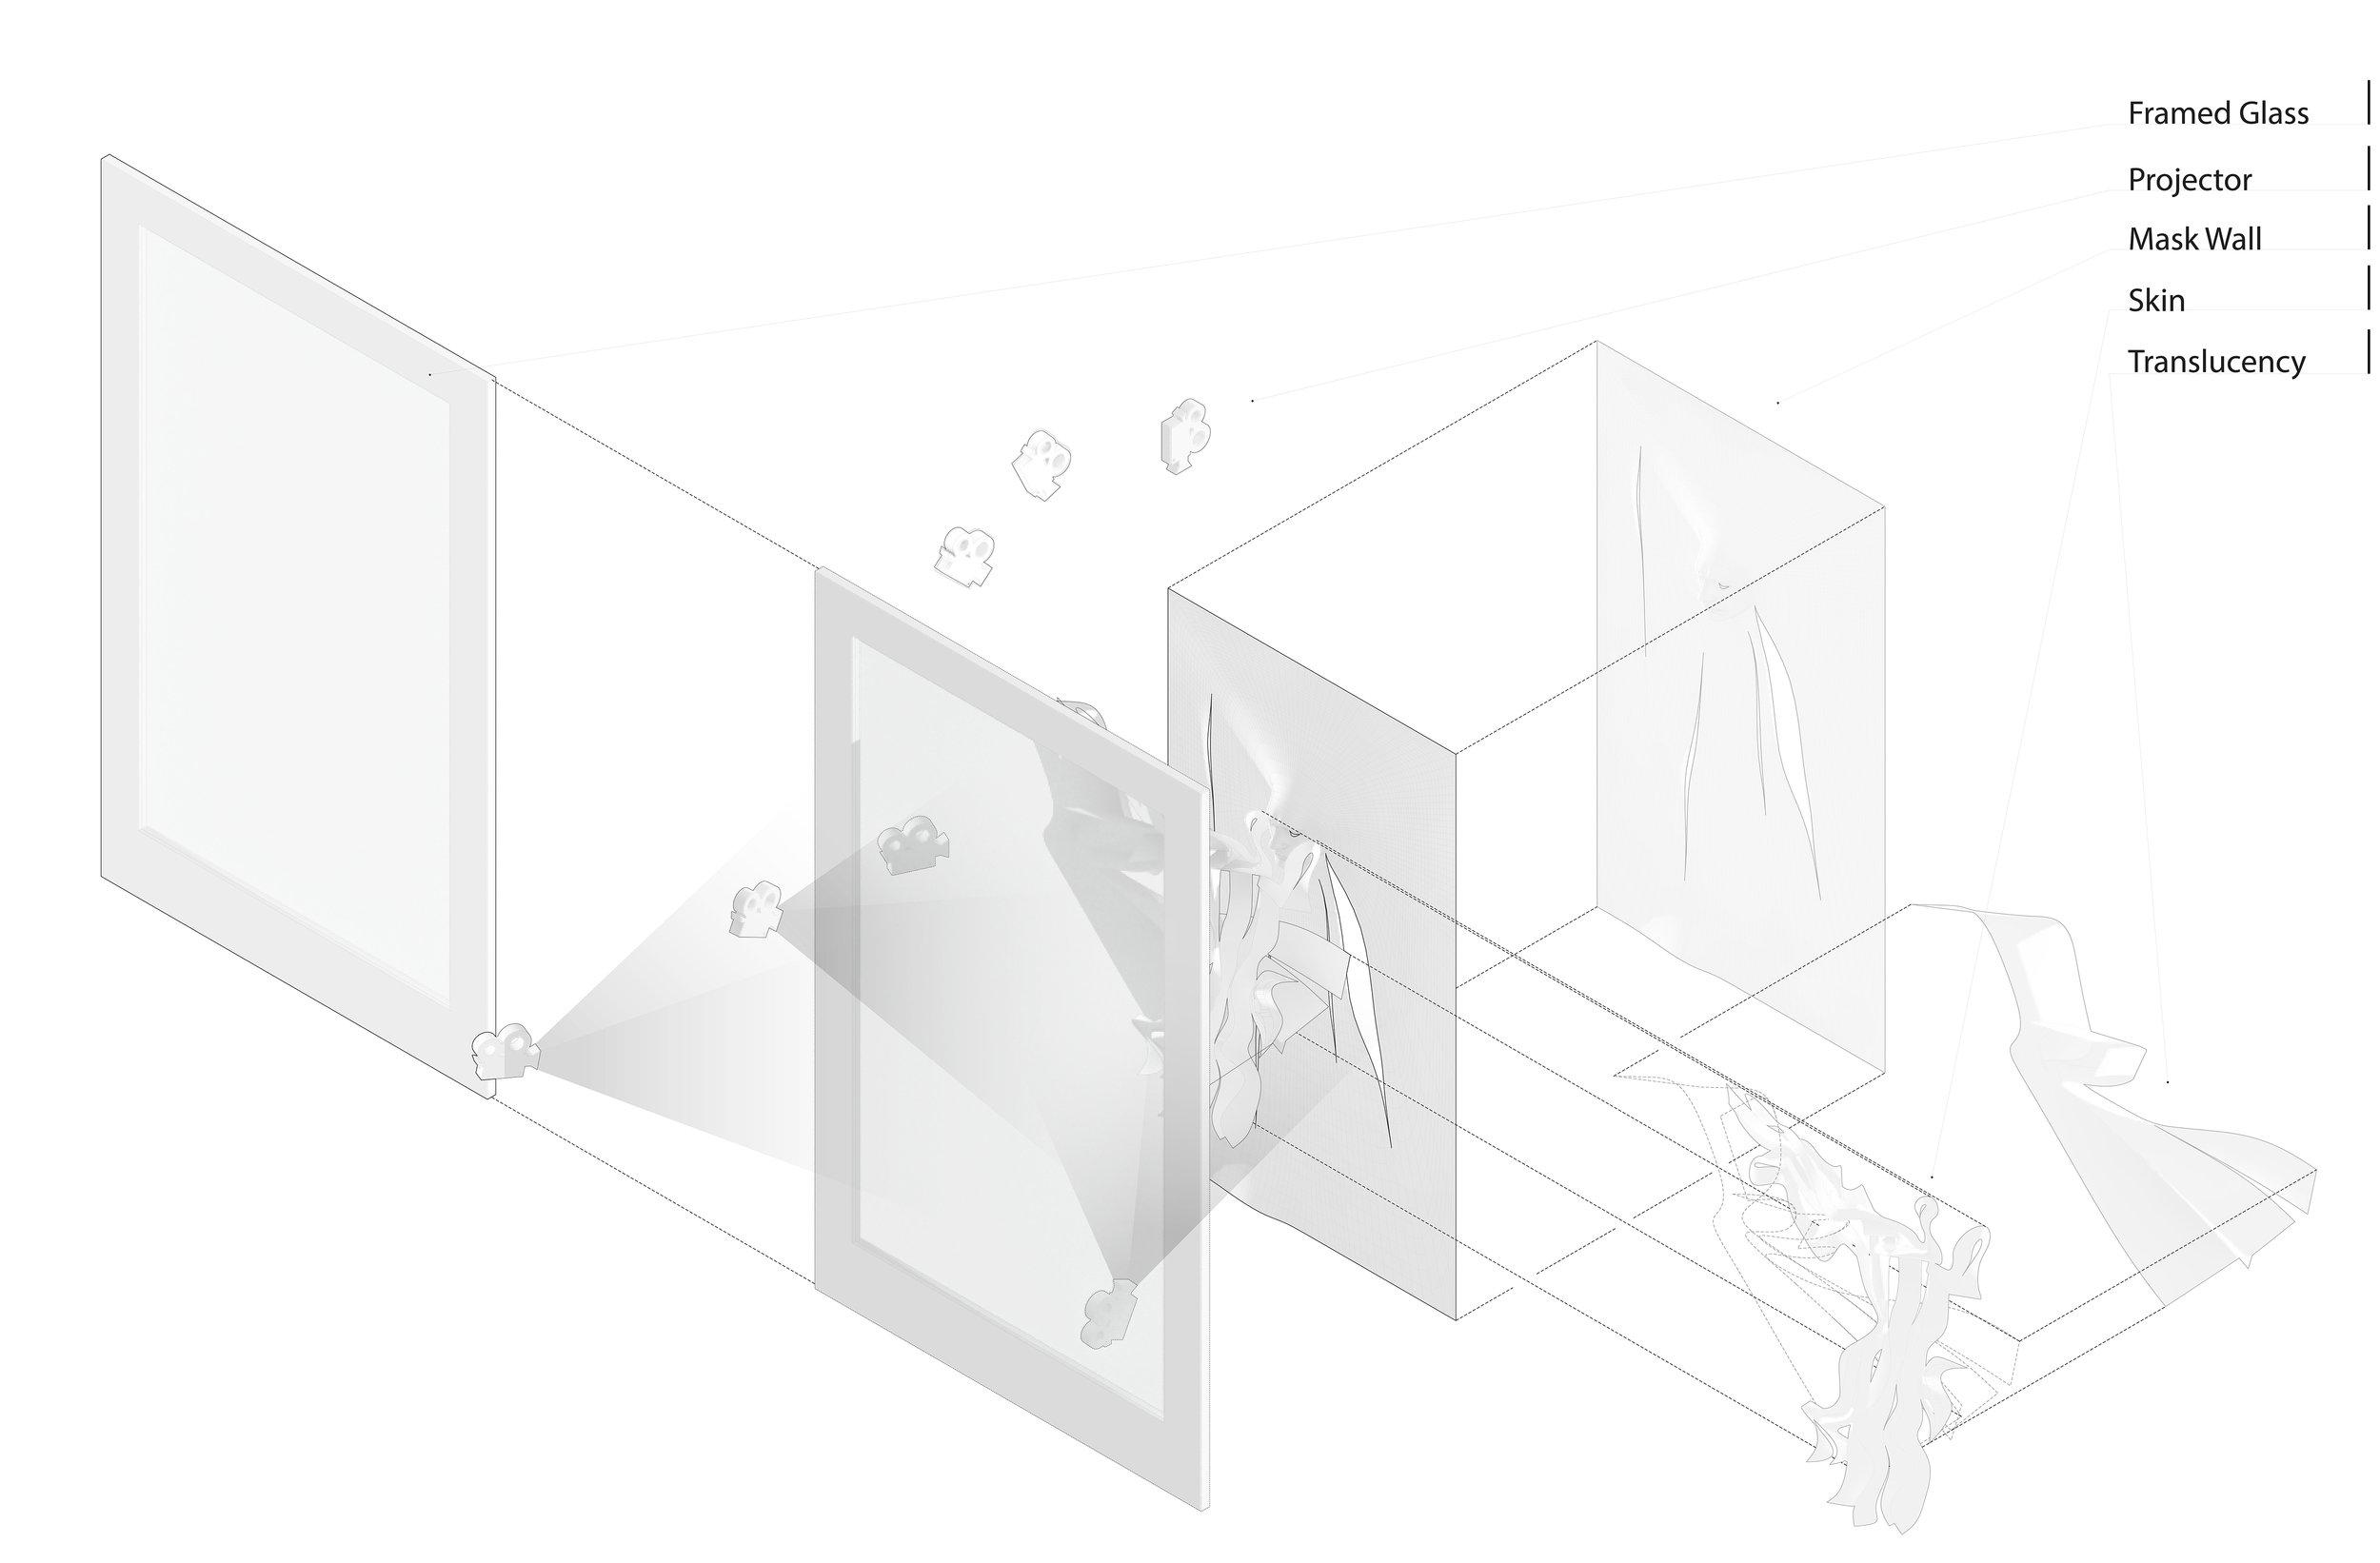 141028 setup drawing1-01.jpg